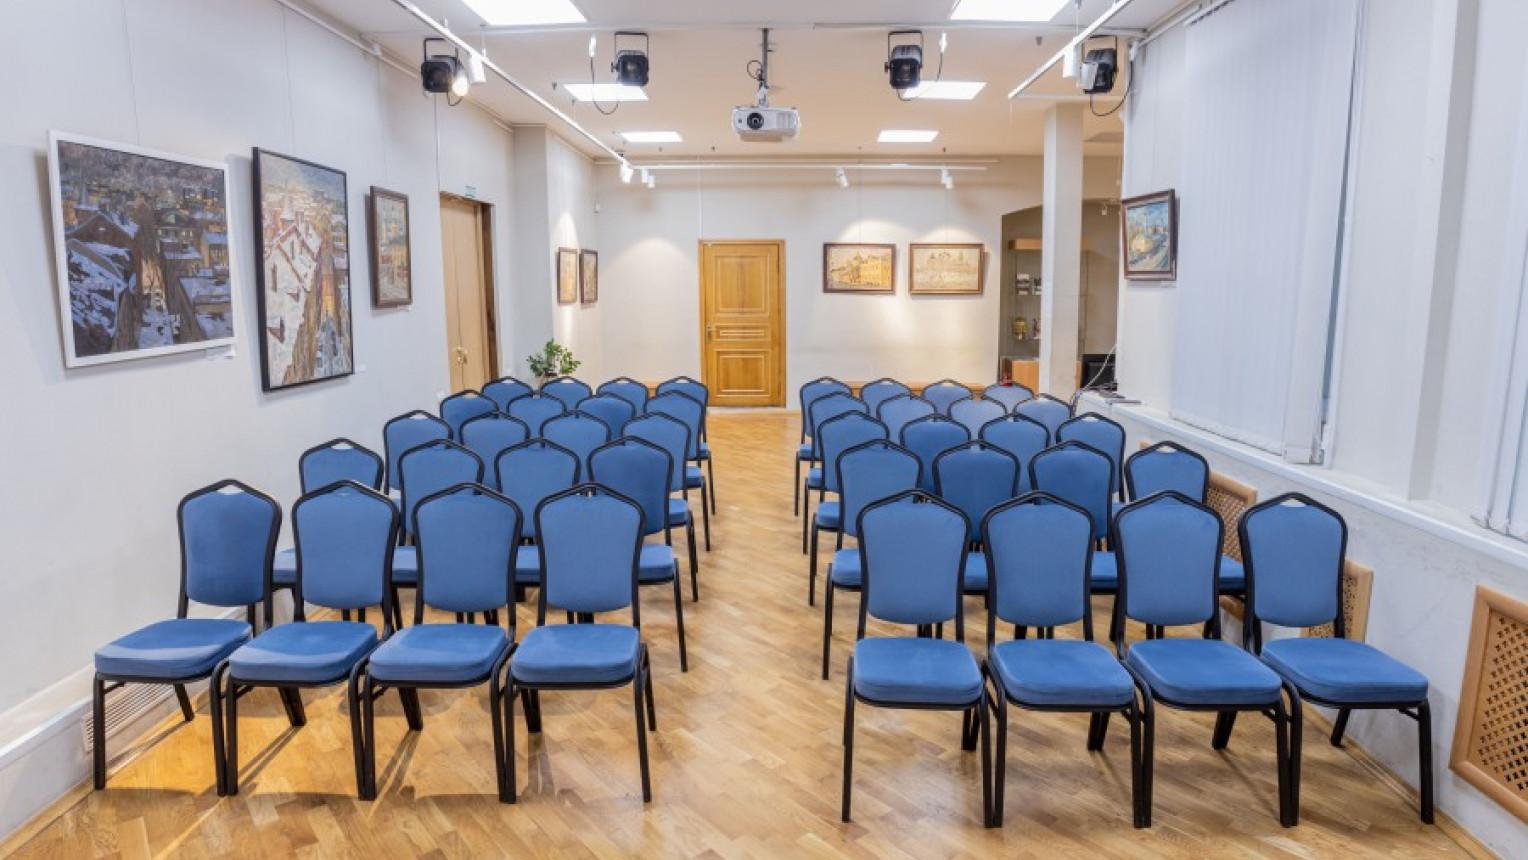 Зал для семинаров, презентаций, тренингов - фото №2